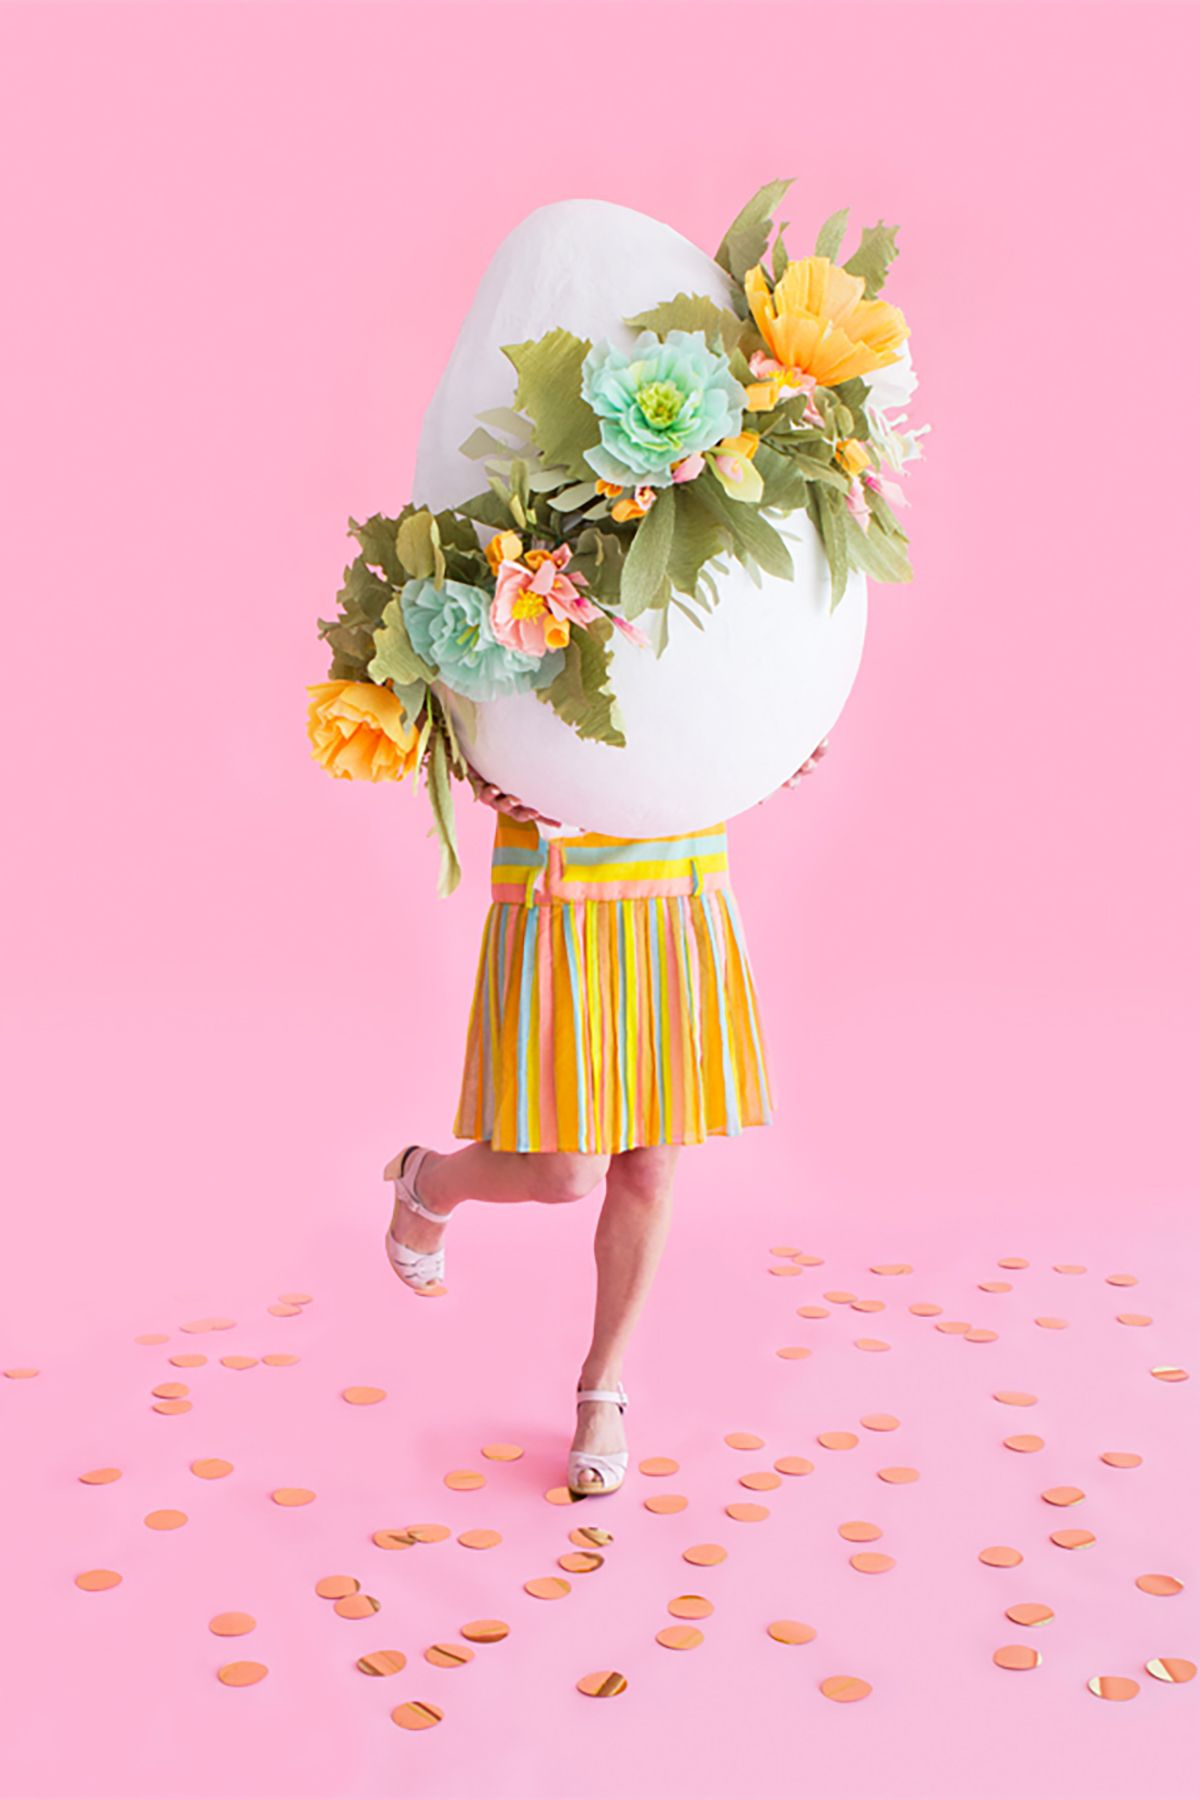 60 Fun Easter Egg Designs Creative Ideas For Easter Egg